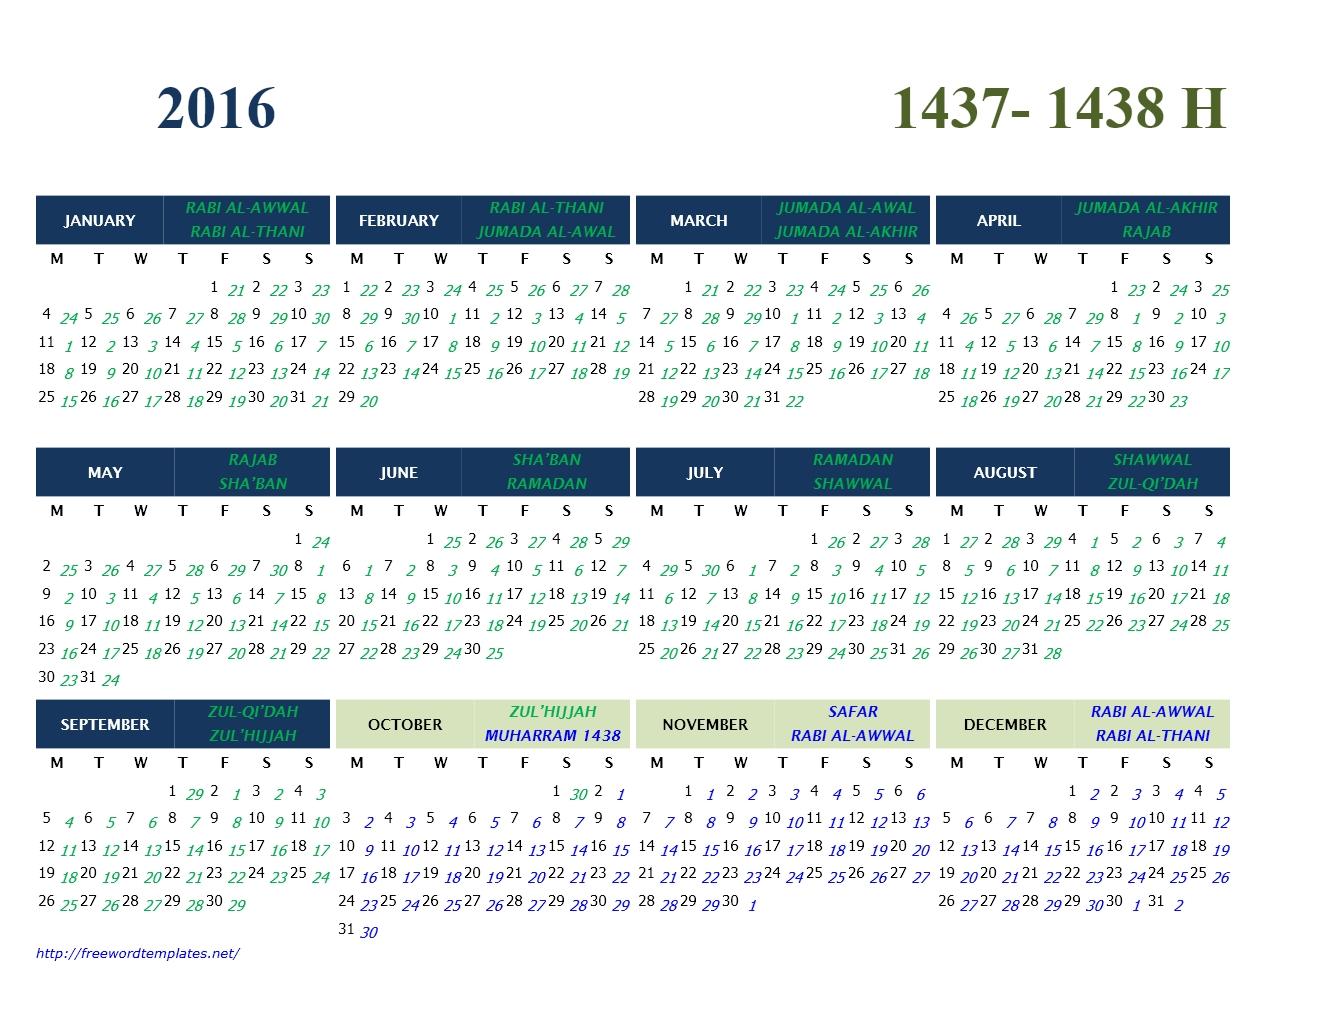 2016 Islamic Calendar Template pertaining to Free Calendar 2012 December Islamic